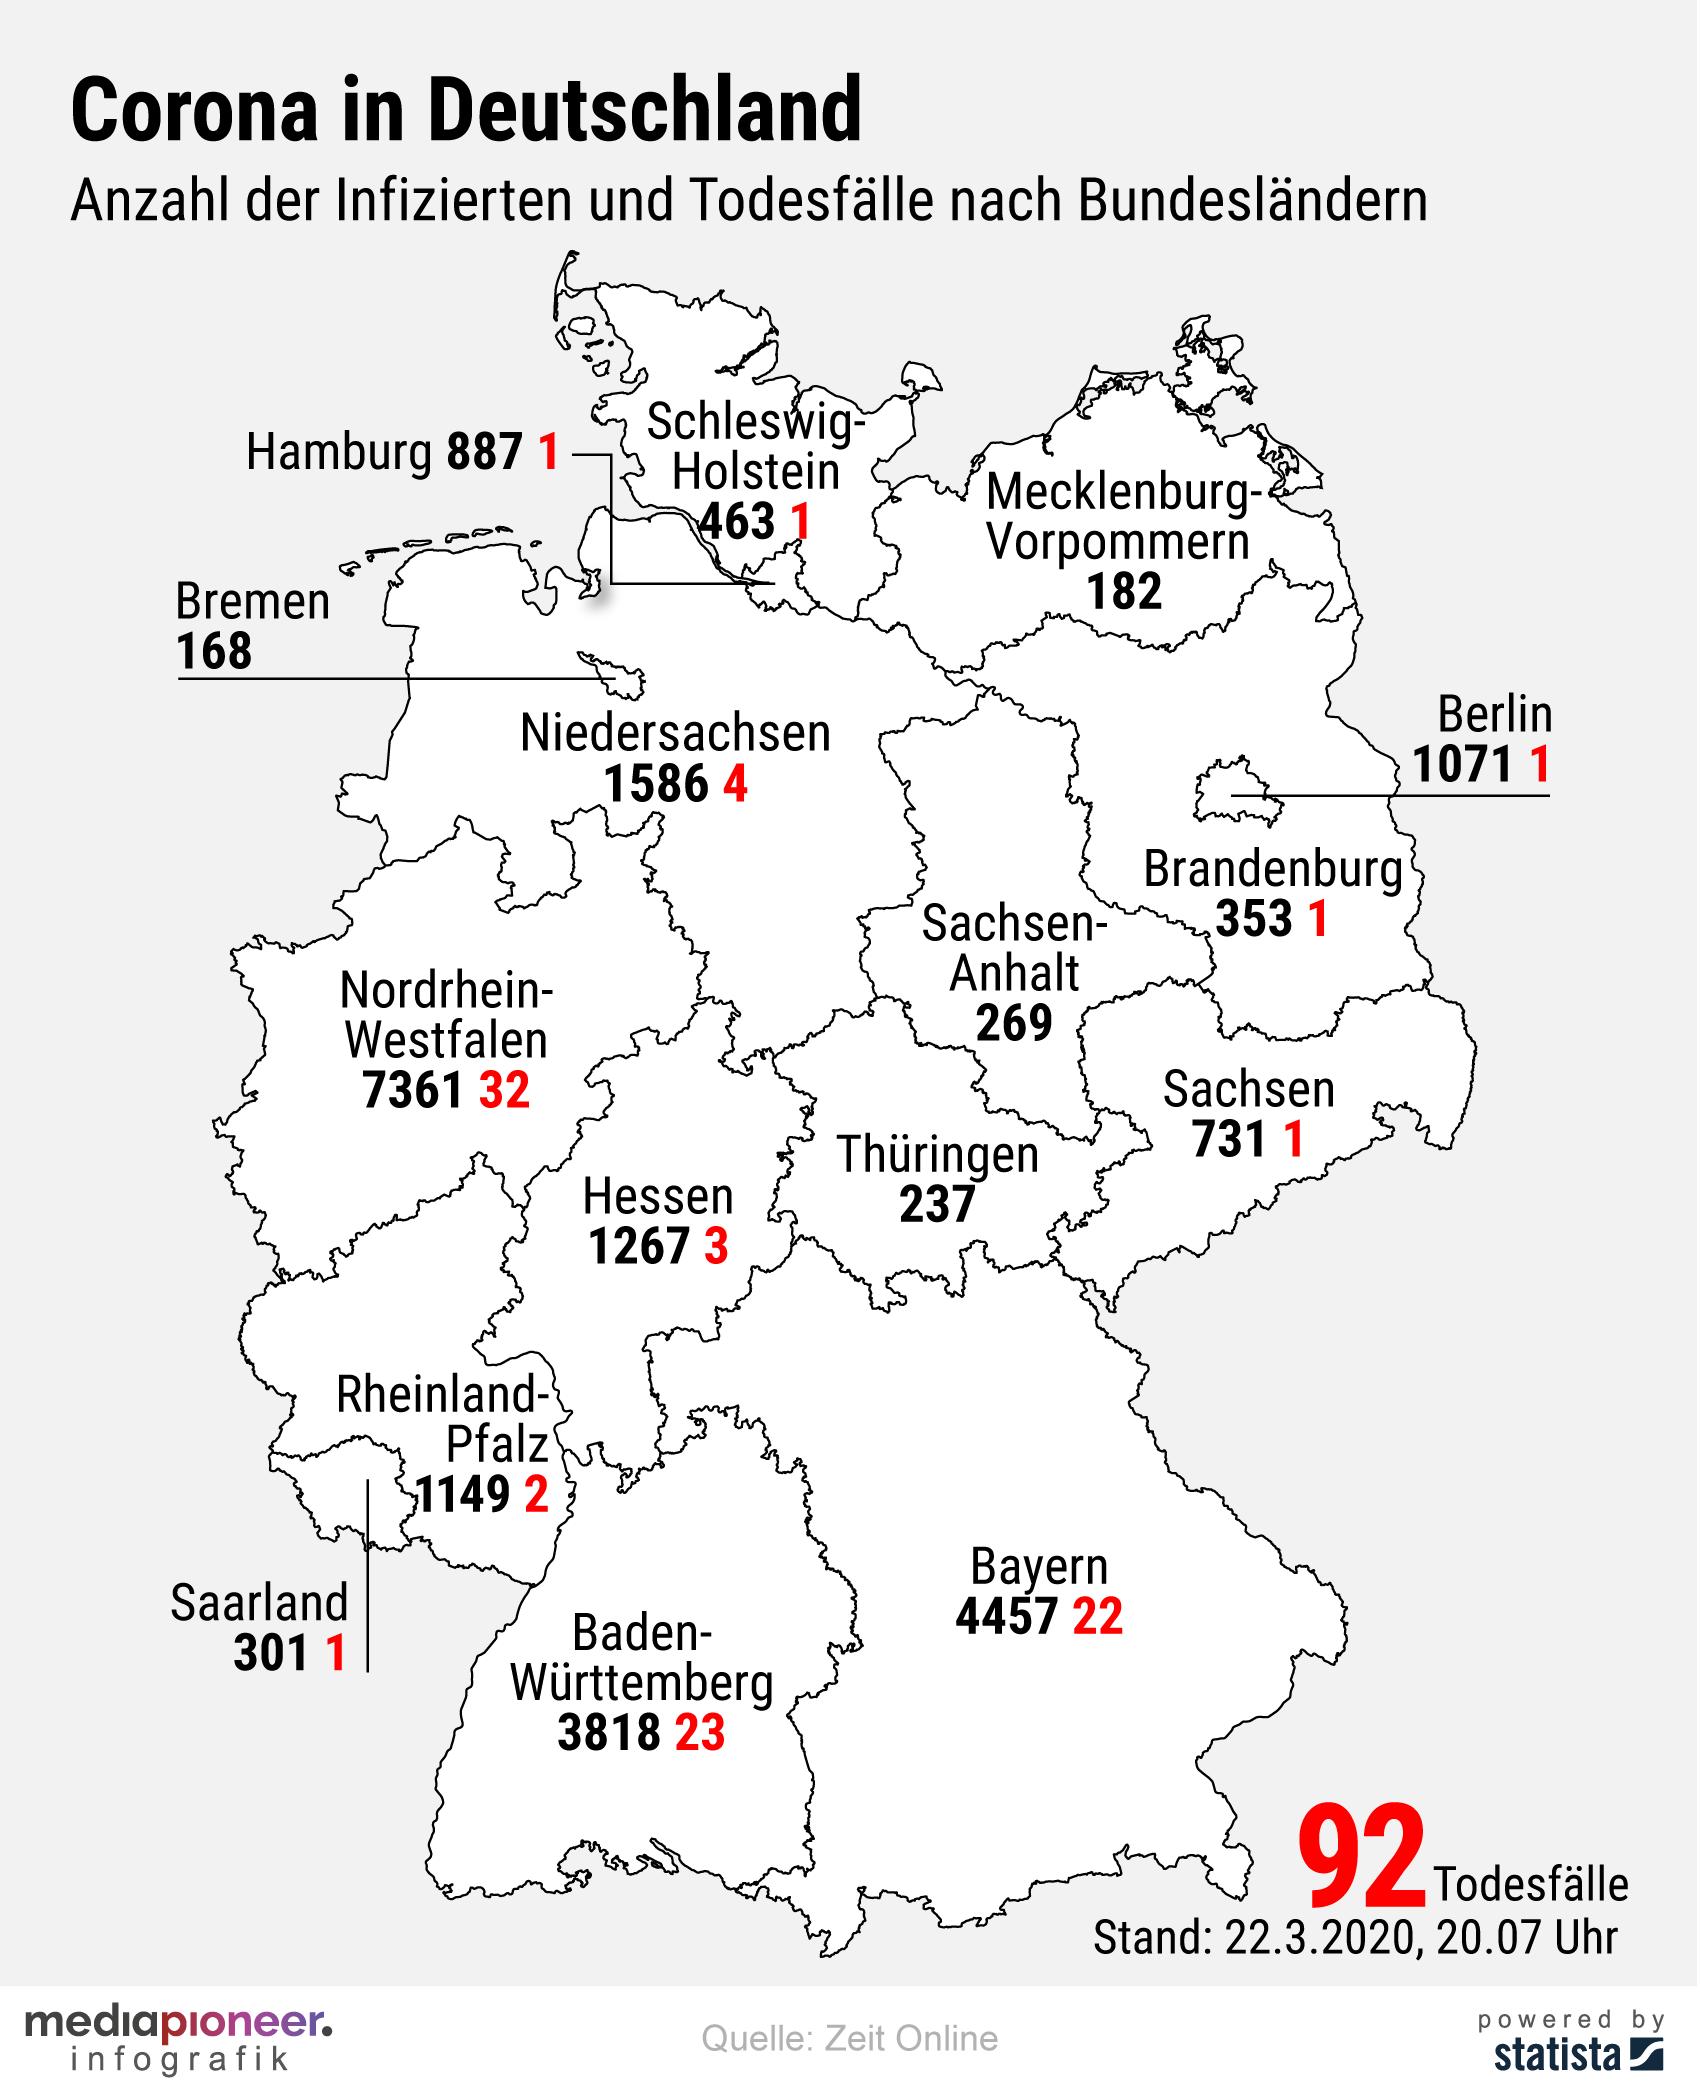 200323-infografik-media-pioneer-Corona-Bundeslaender